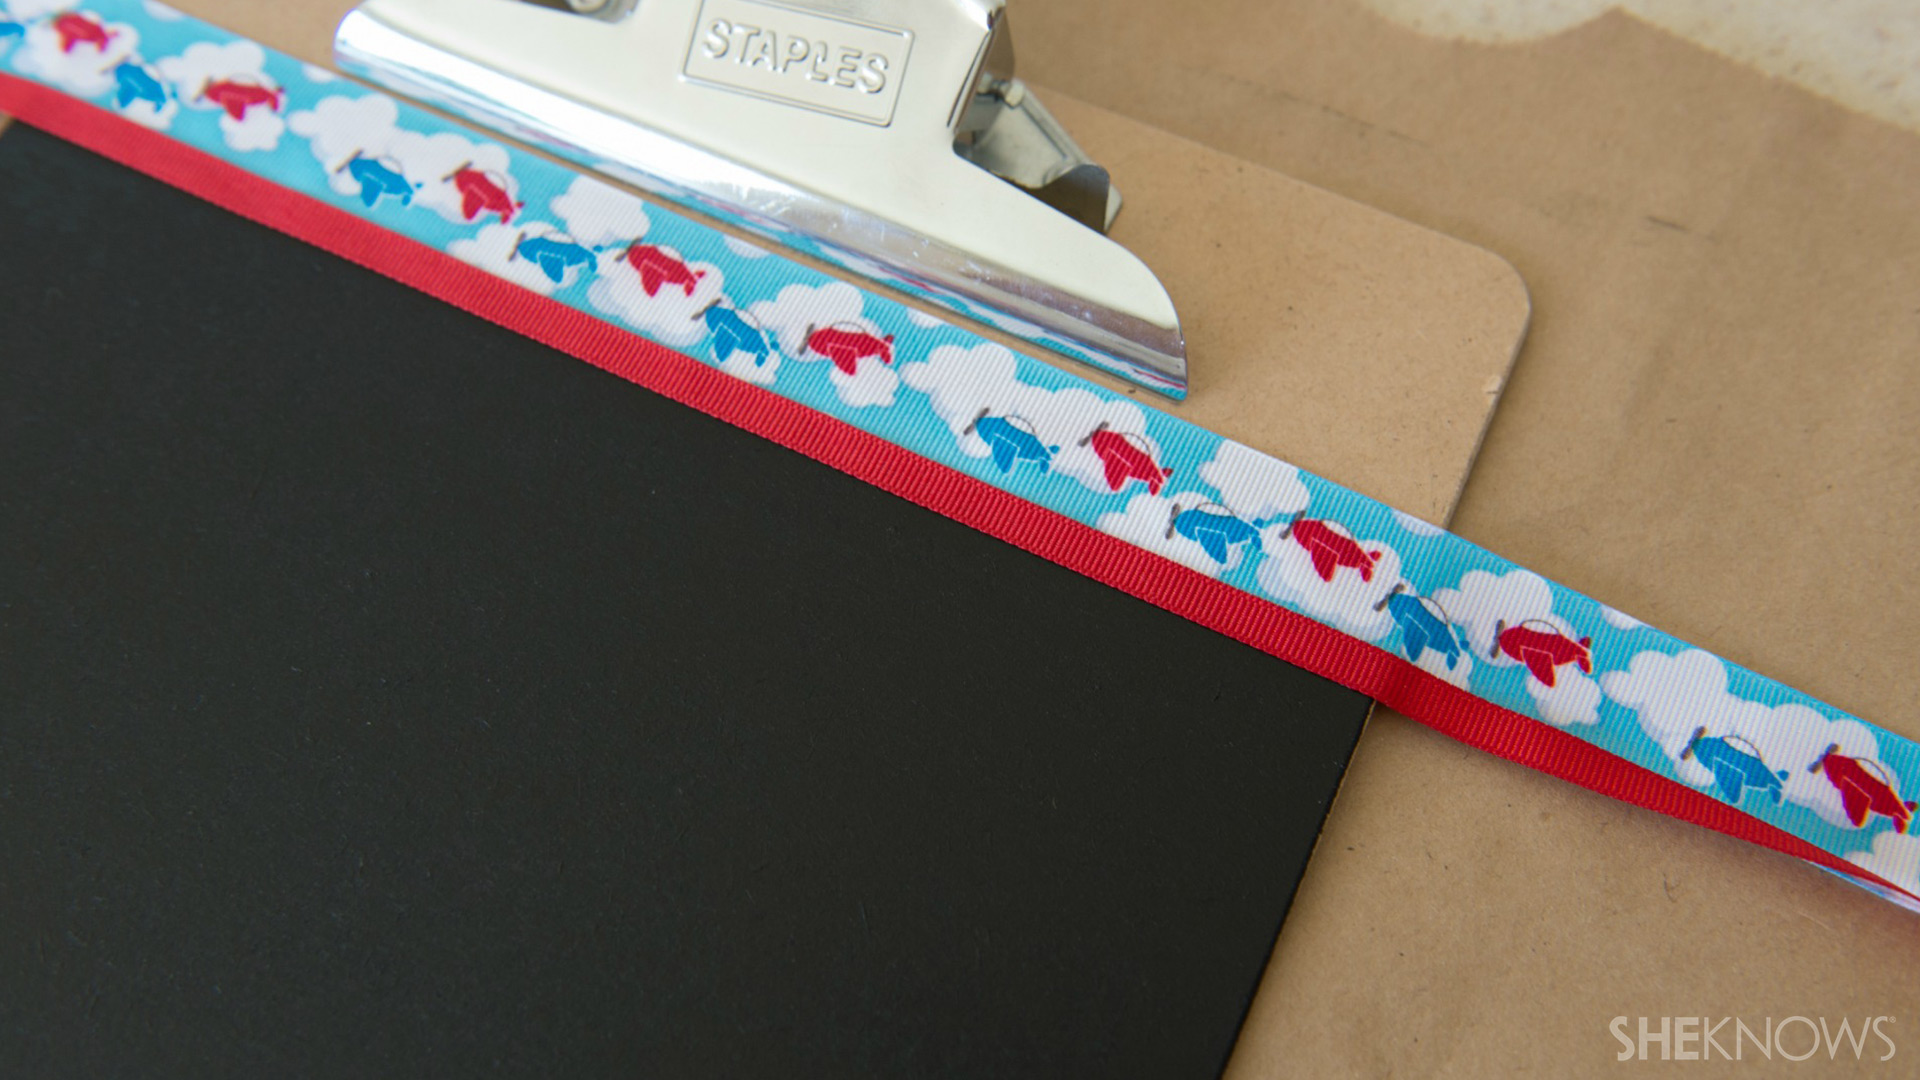 Clipboard | Sheknows.com - cut ribbon